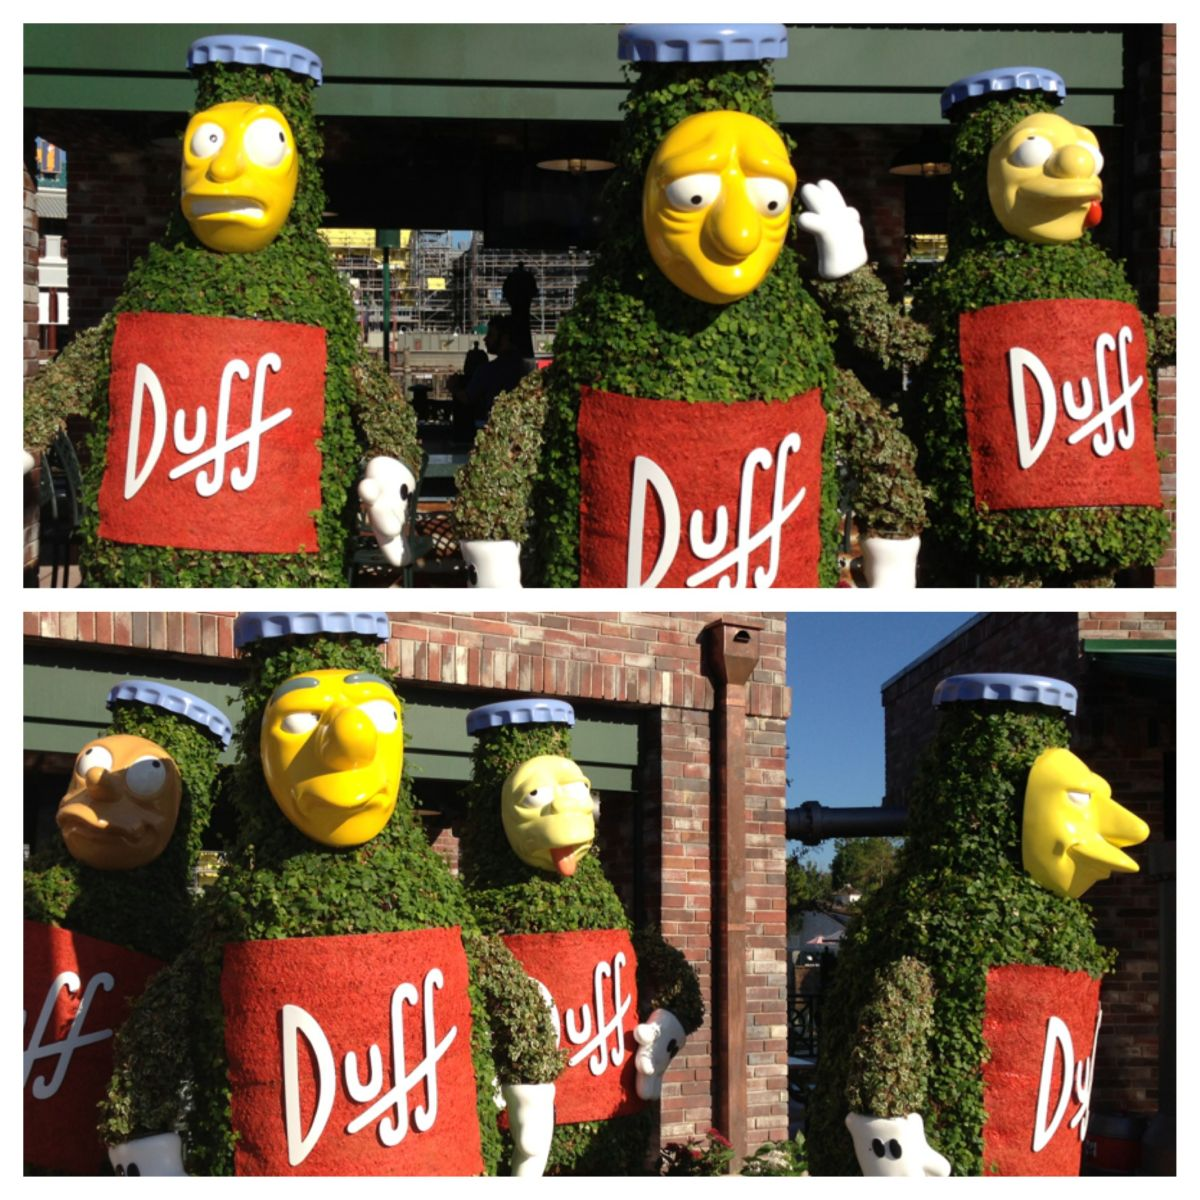 duff gardens